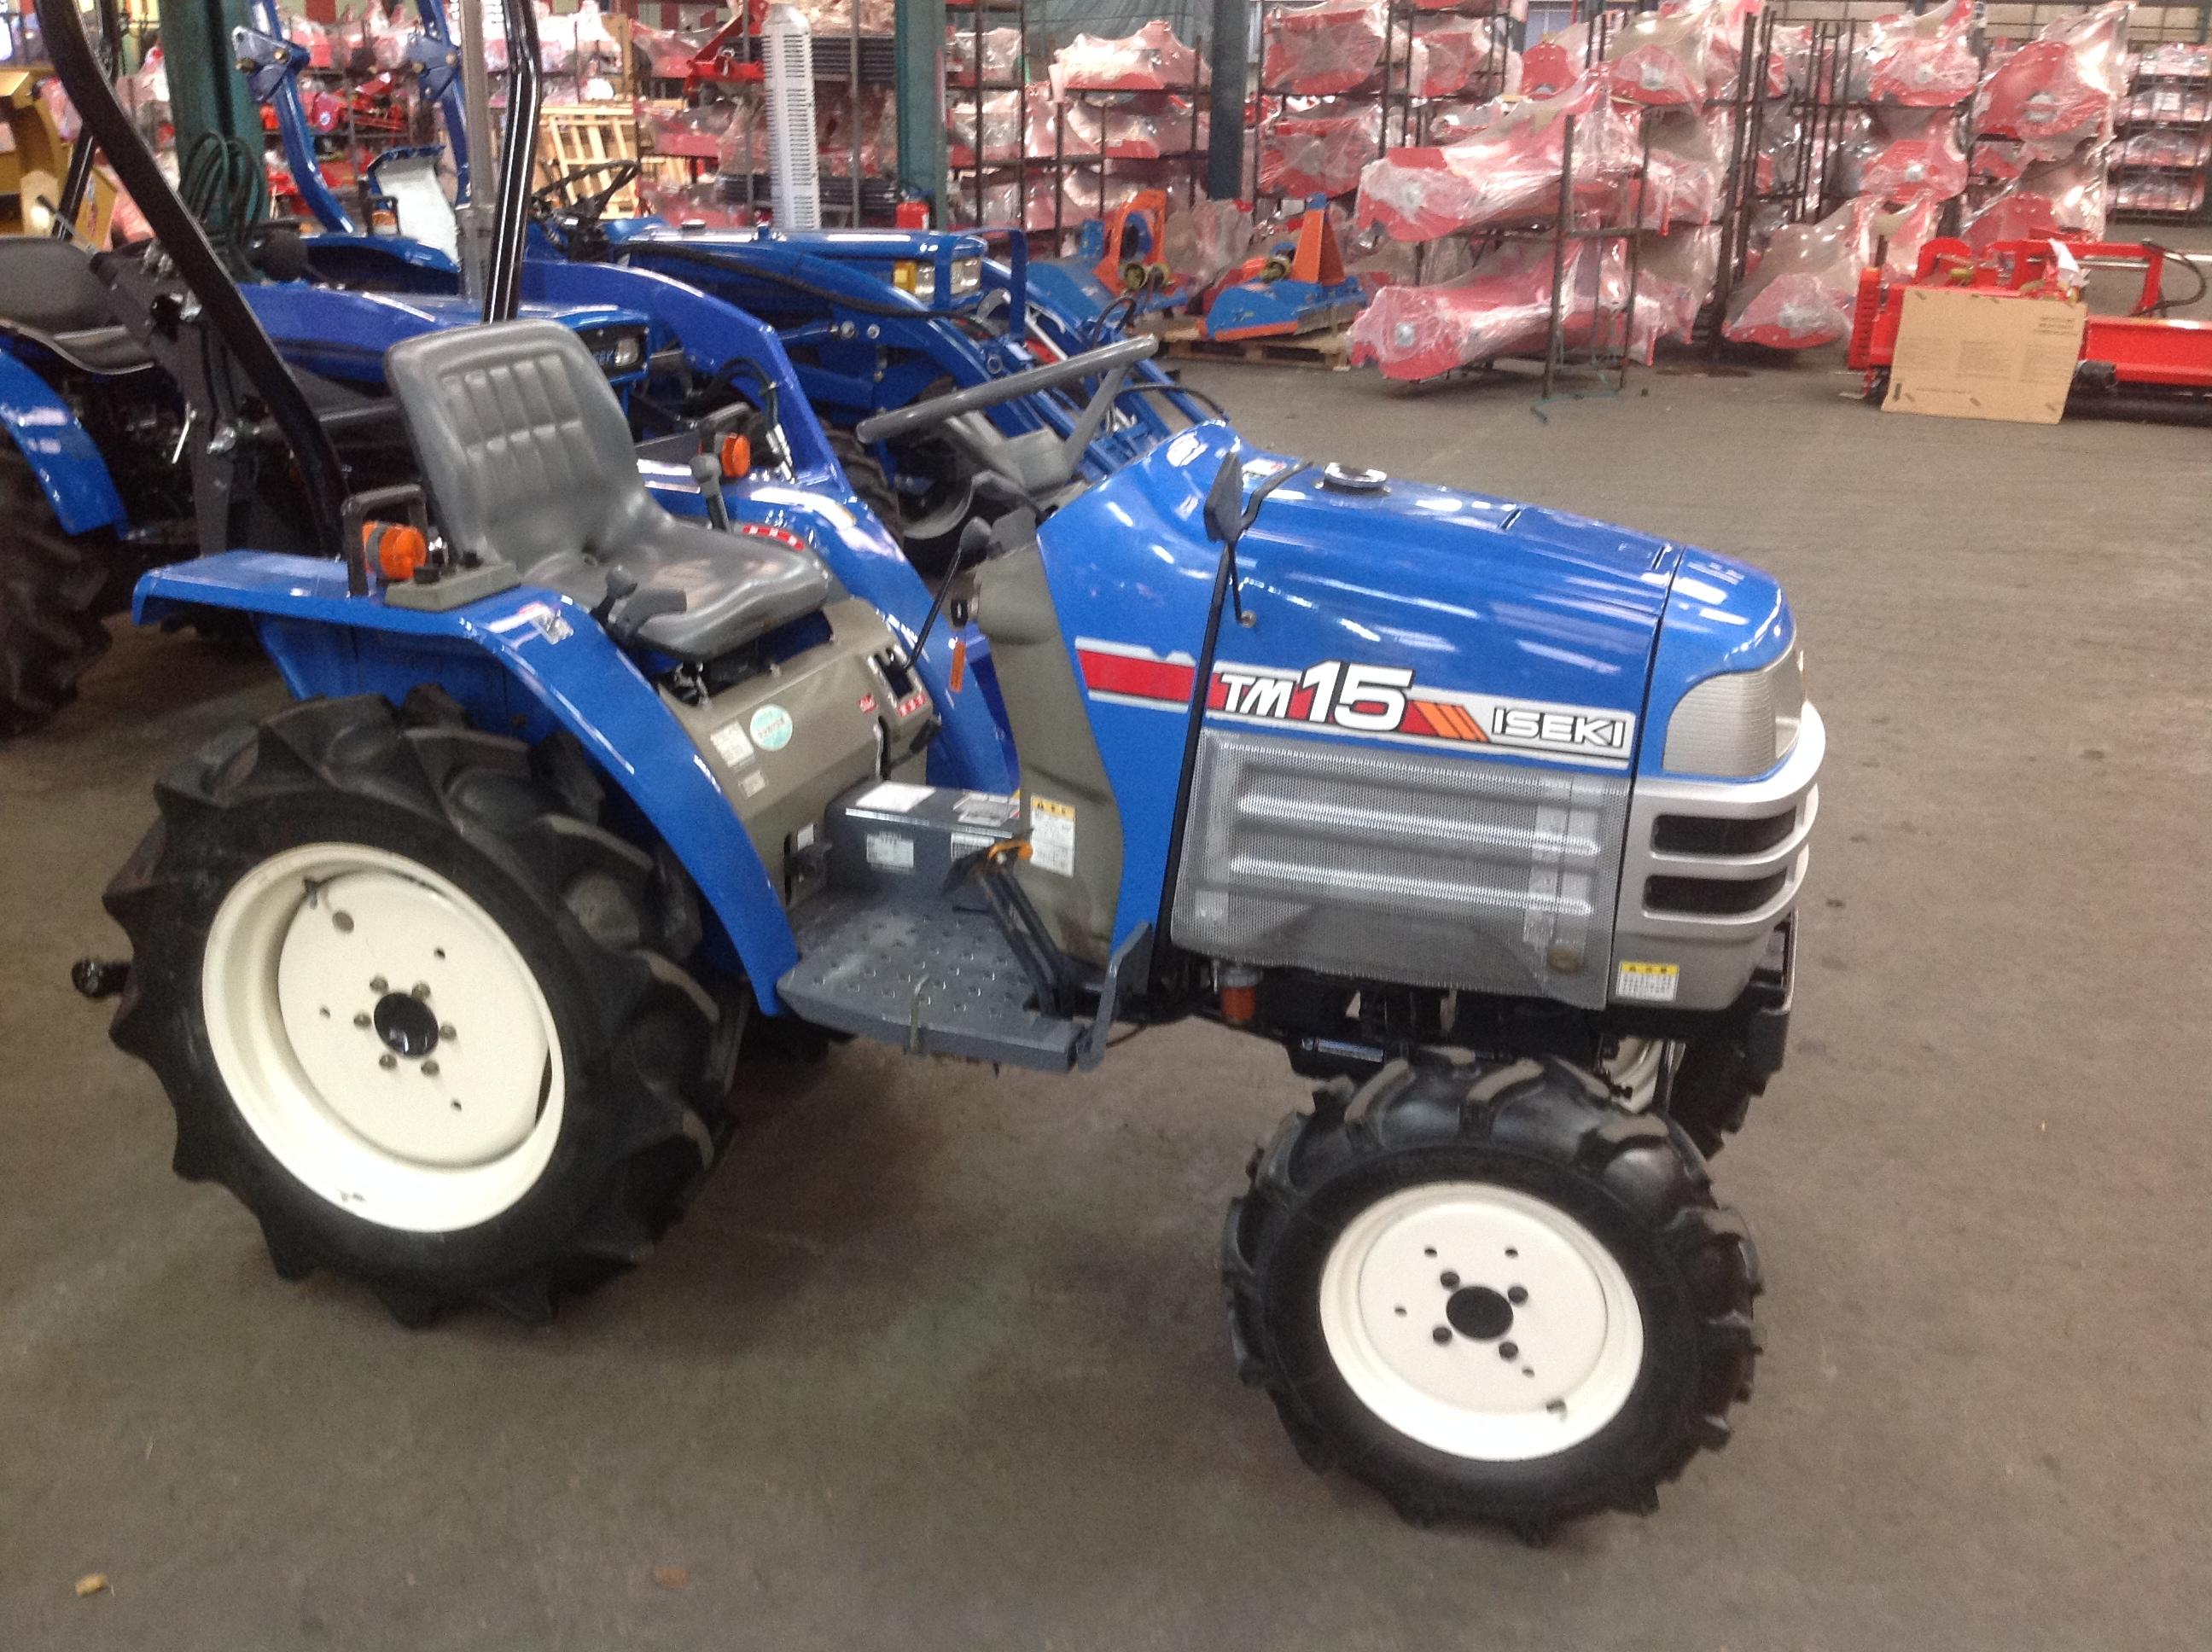 Jp france tracteur iseki tm15 4rm 750cm3 16cv jpl tracteurs et microtracteurs tracteurs - Mini tracteur tondeuse ...